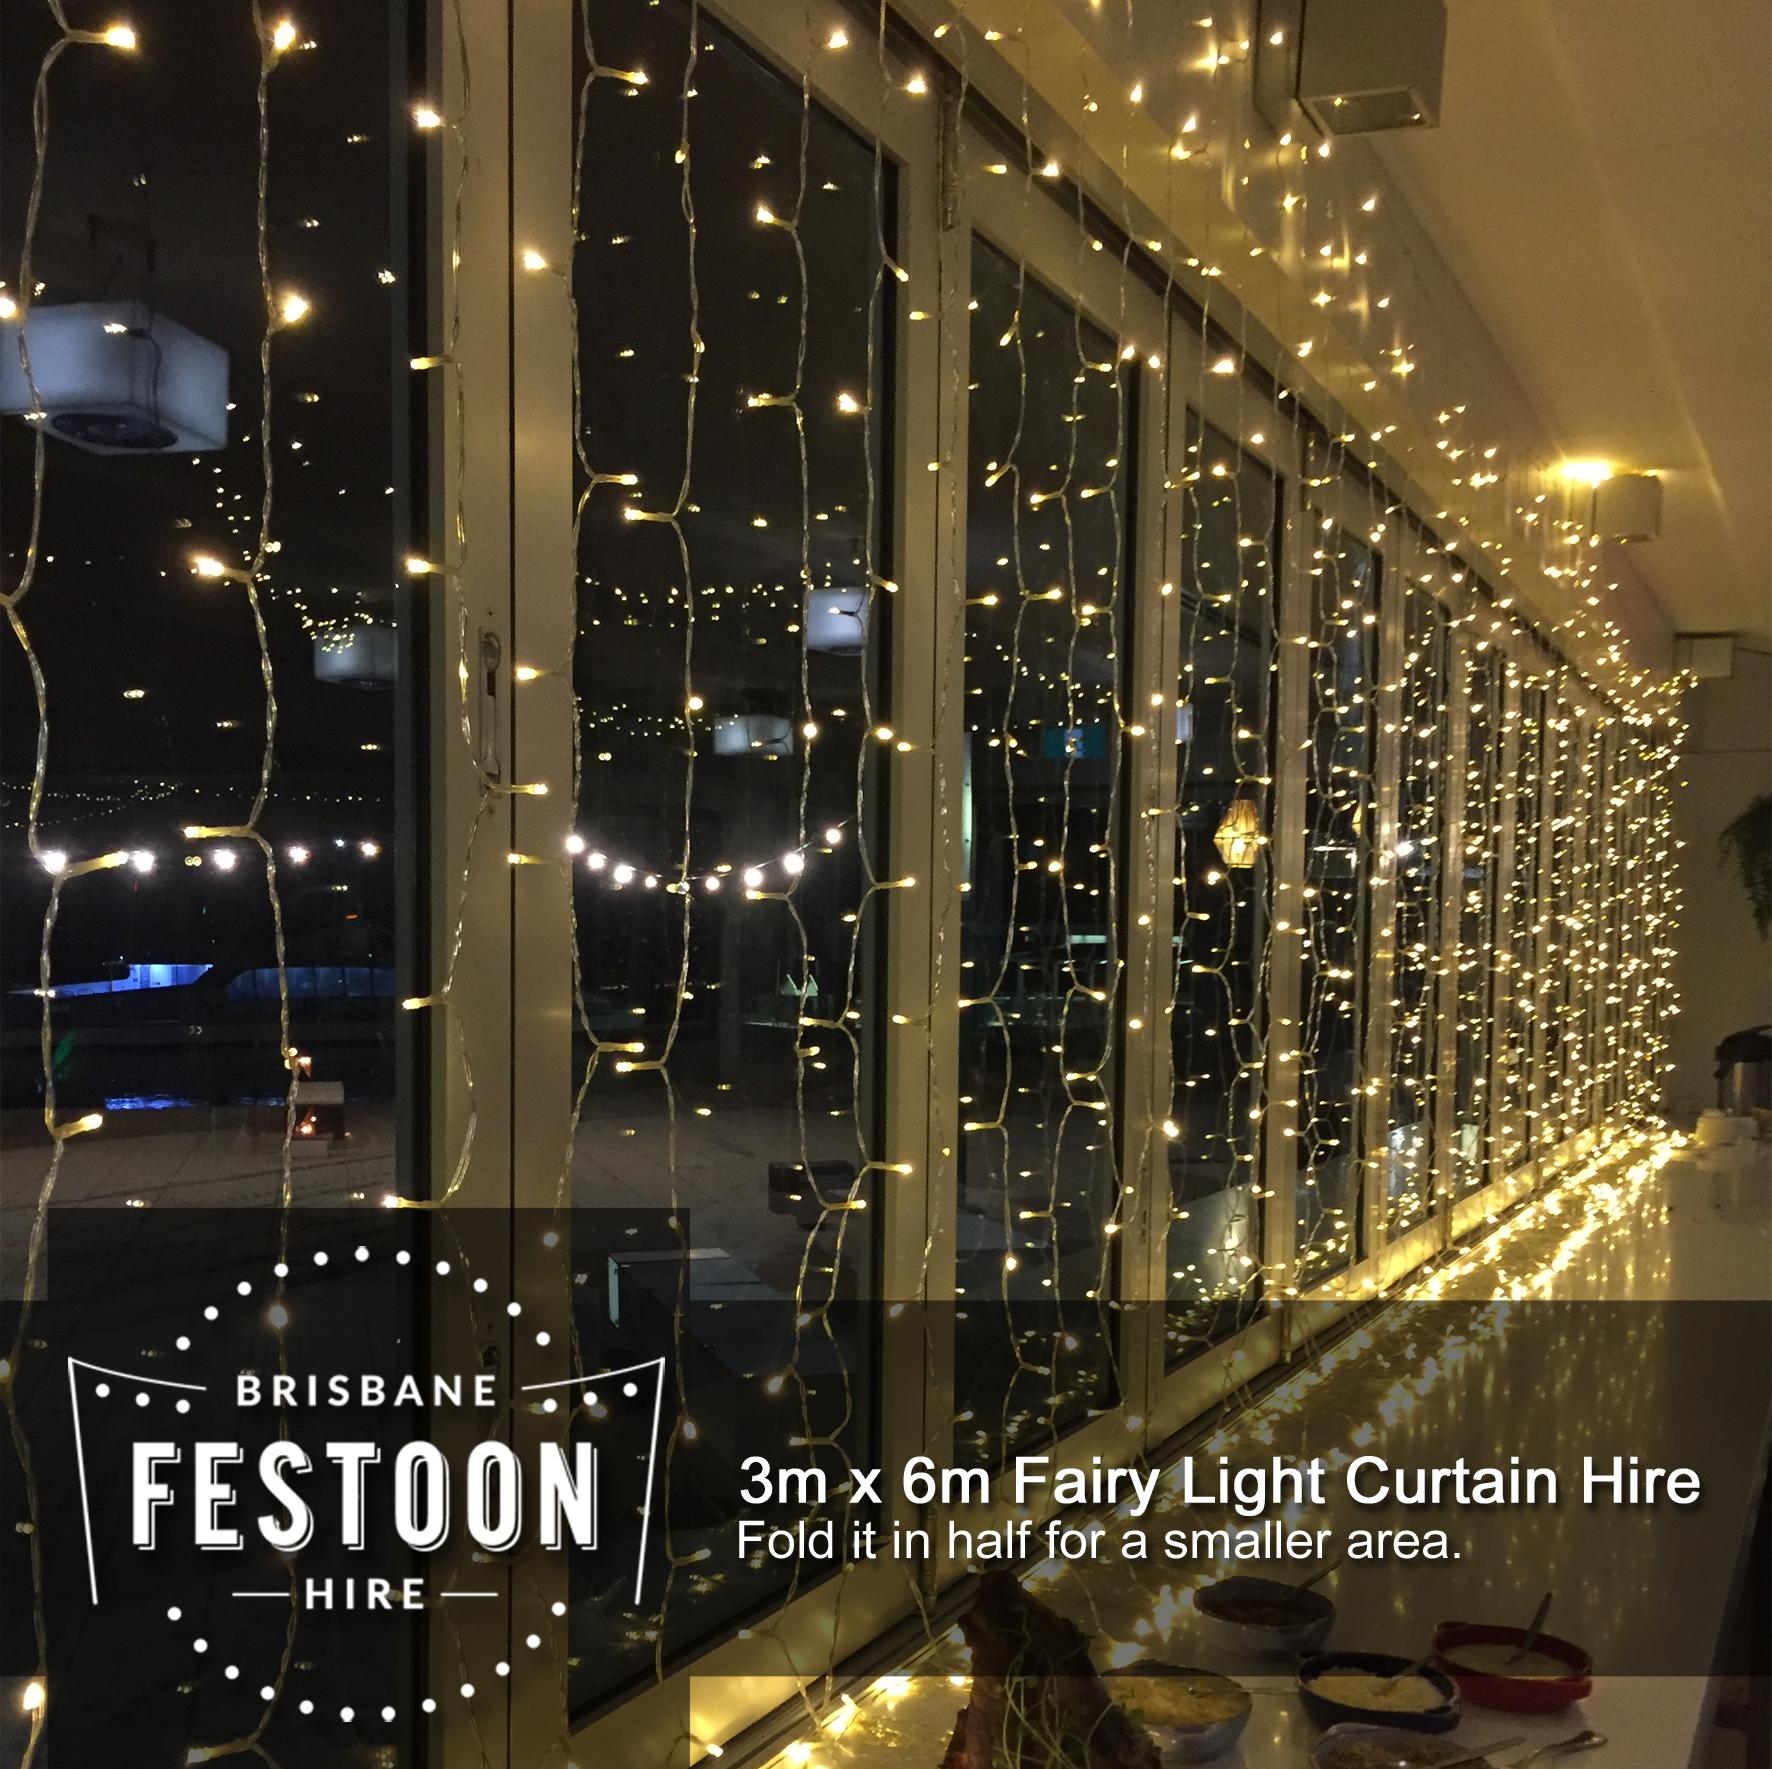 6m X 3m Fairy Light Curtain Hire Brisbane Festoon Hire